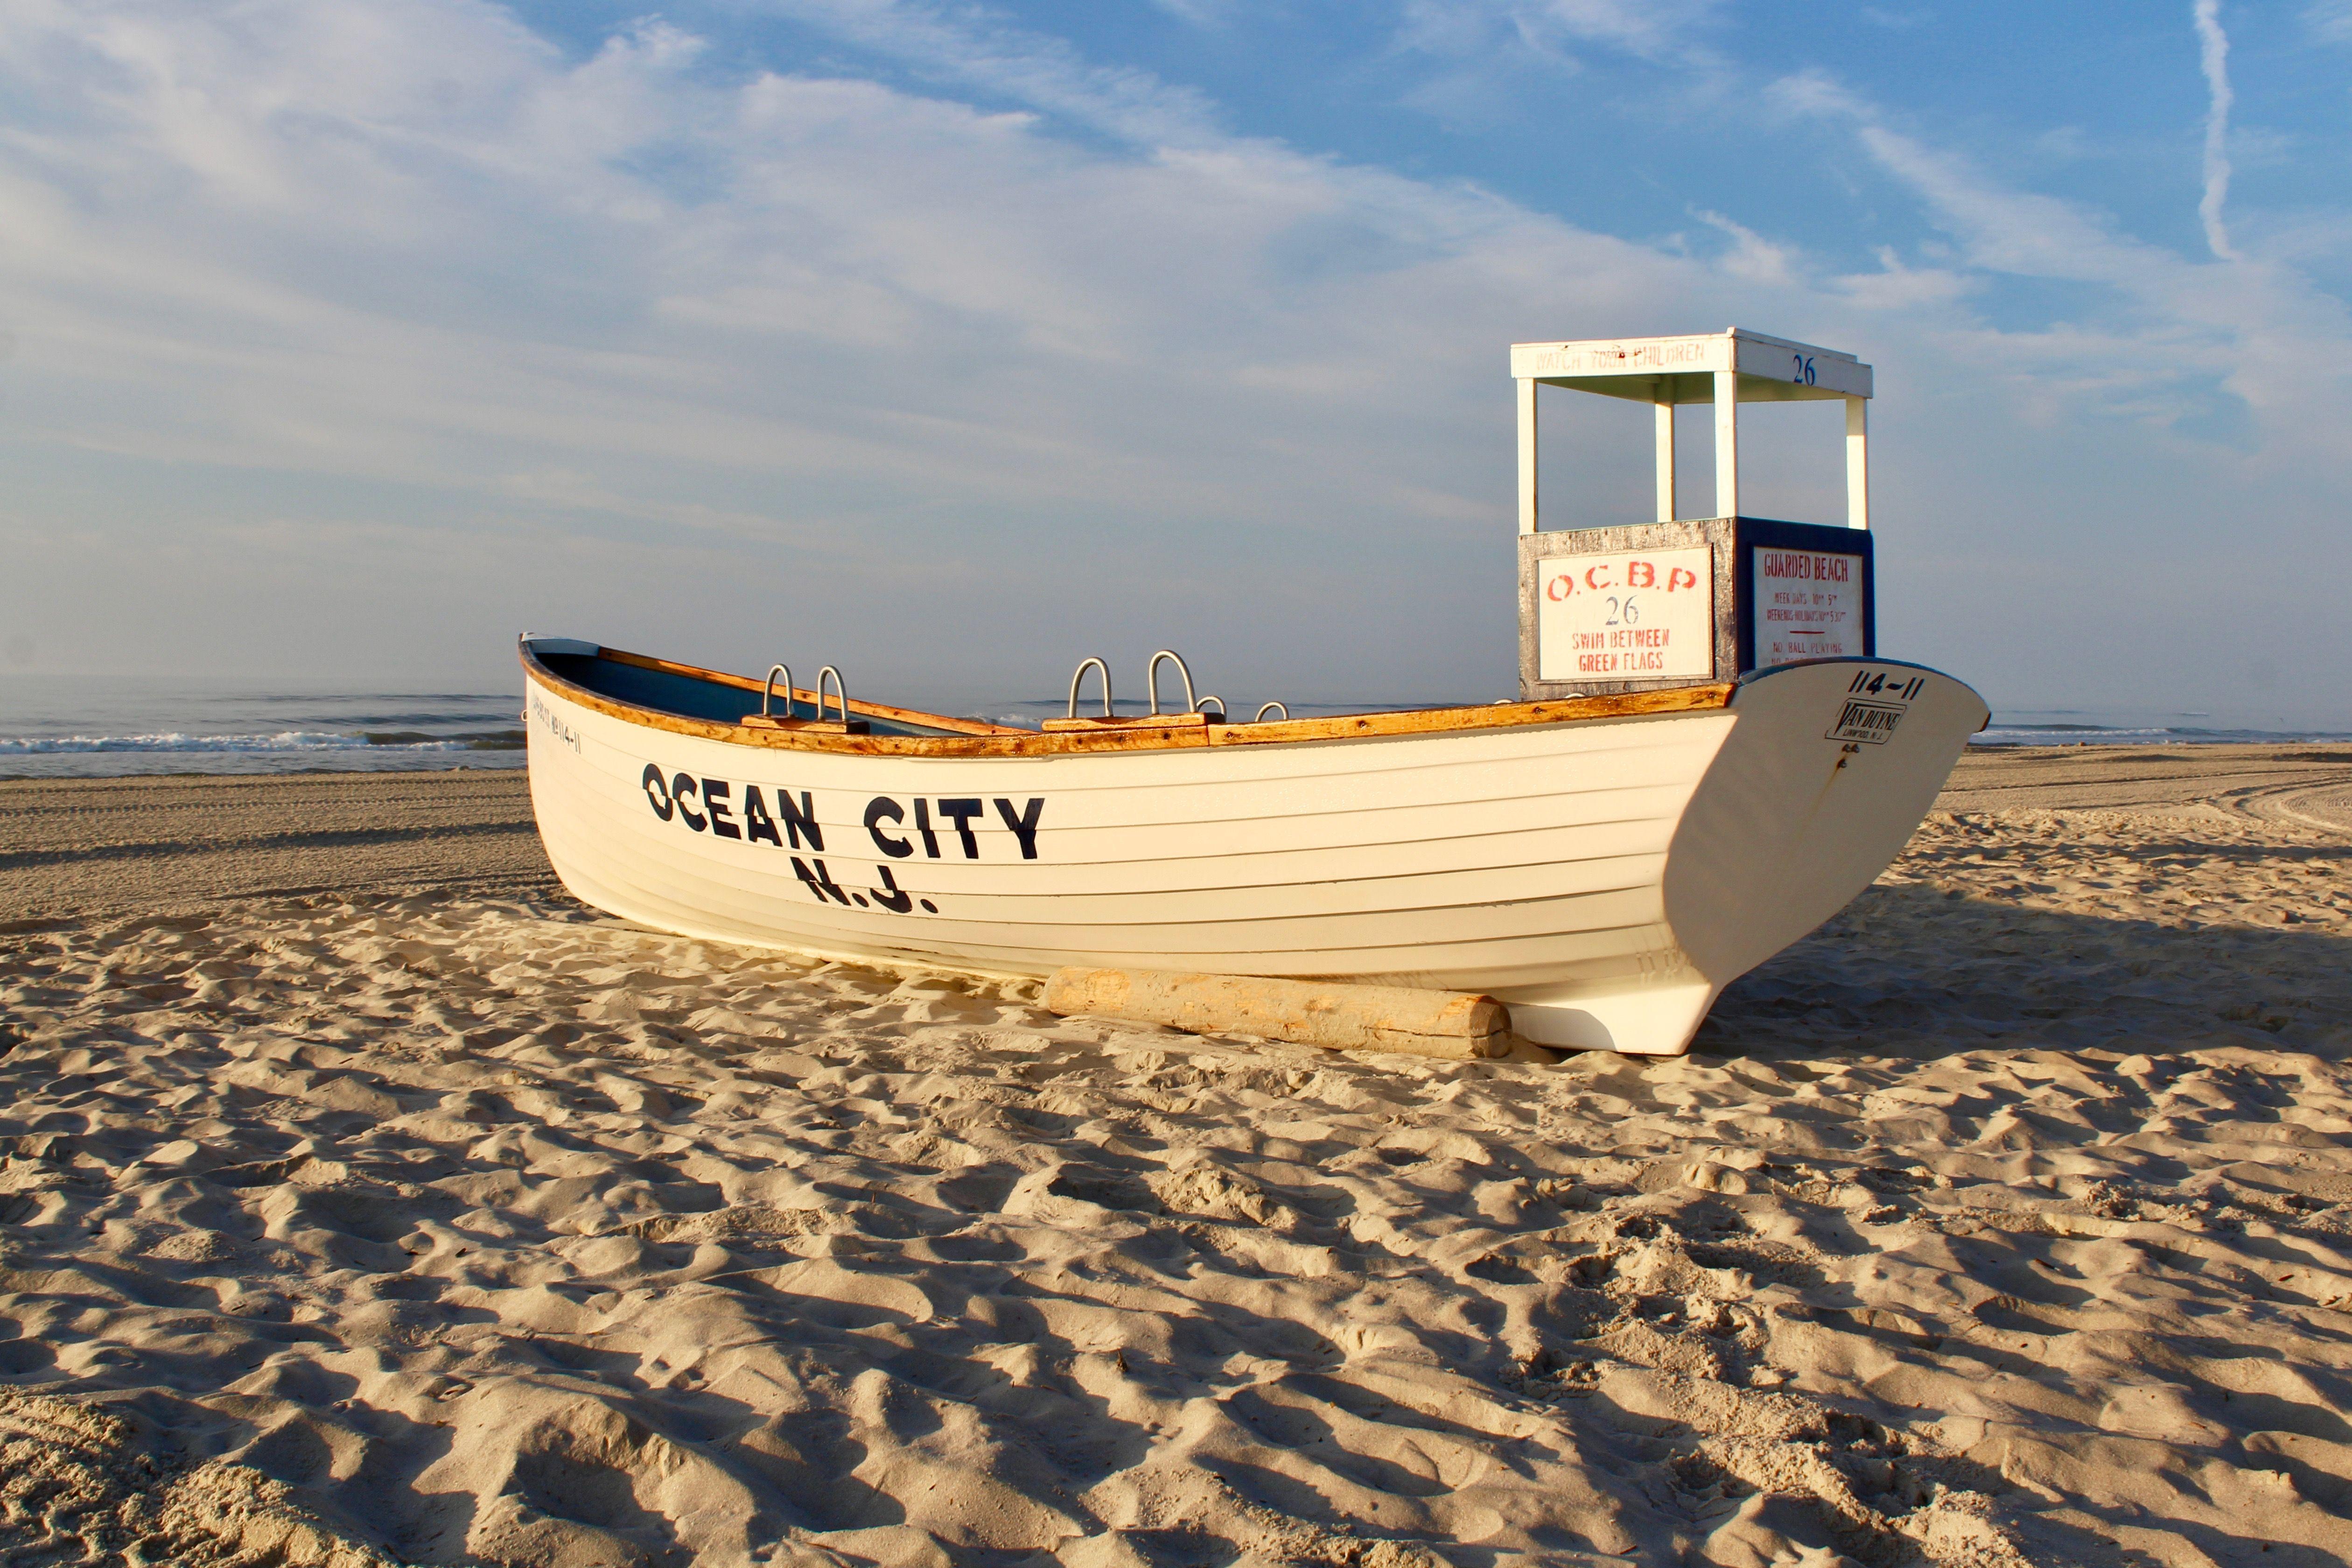 Morning in ocean city new jersey 221 ocean city ocean